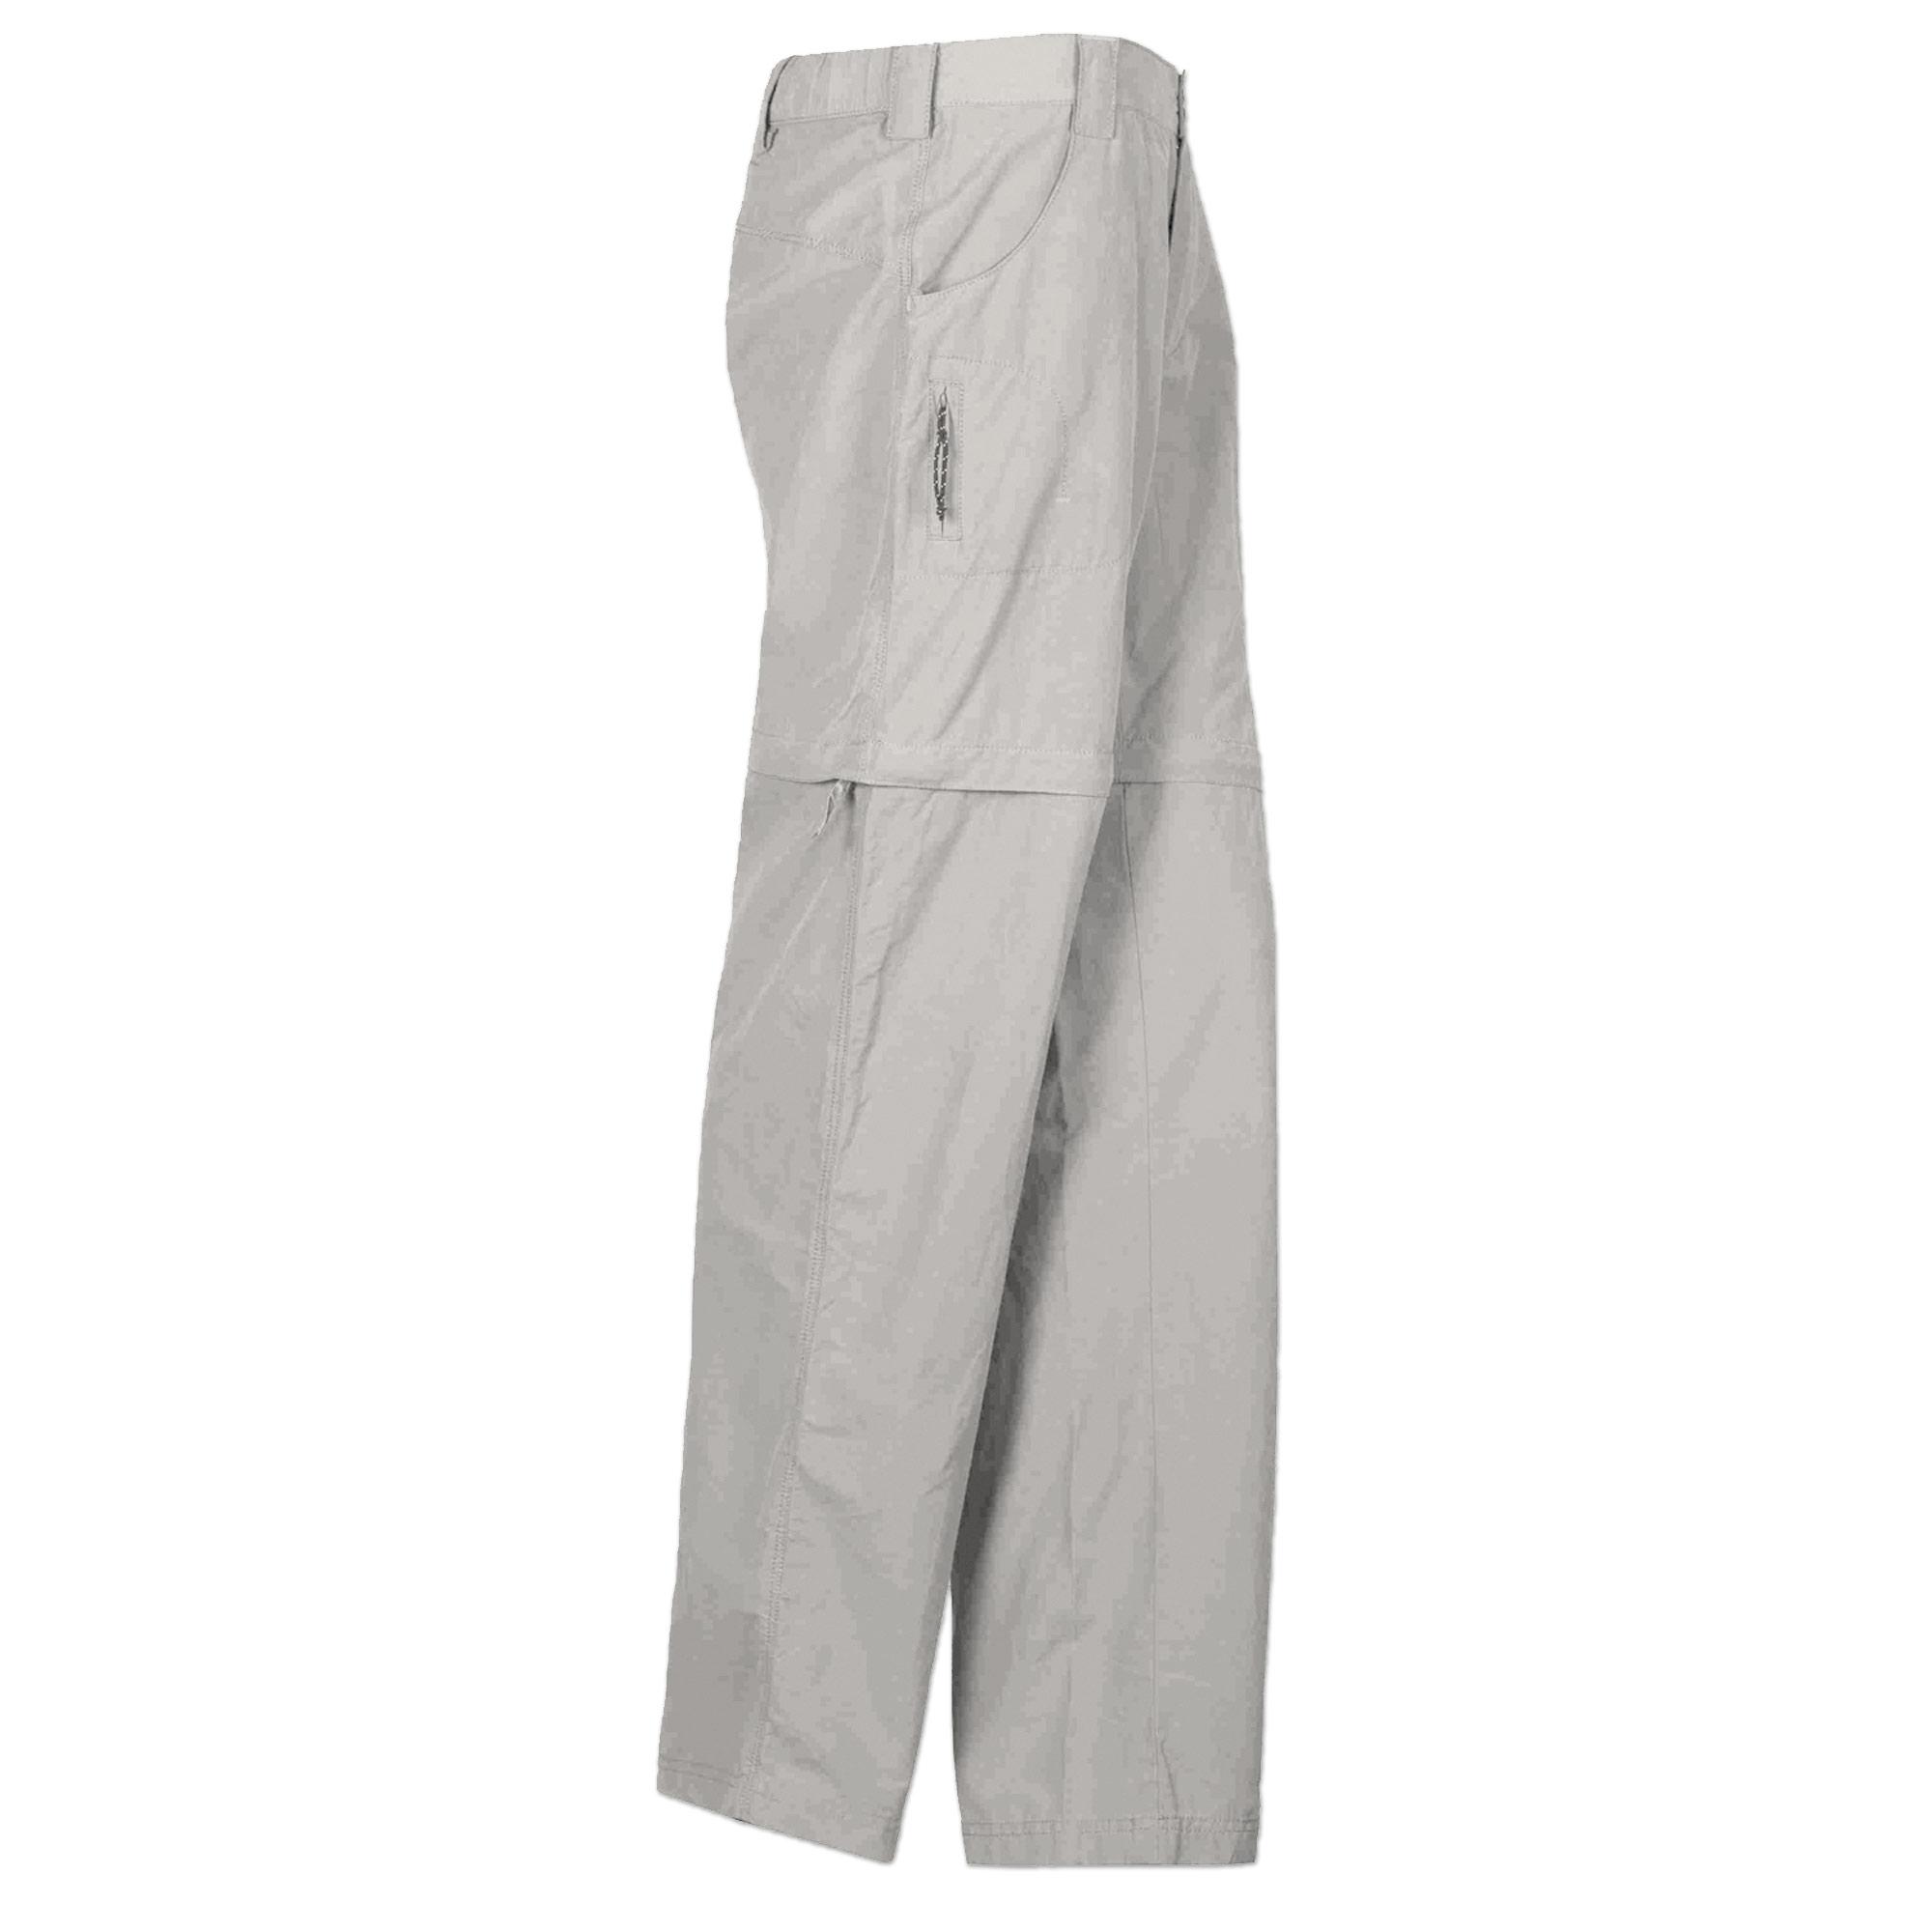 Women's Convertible Pant